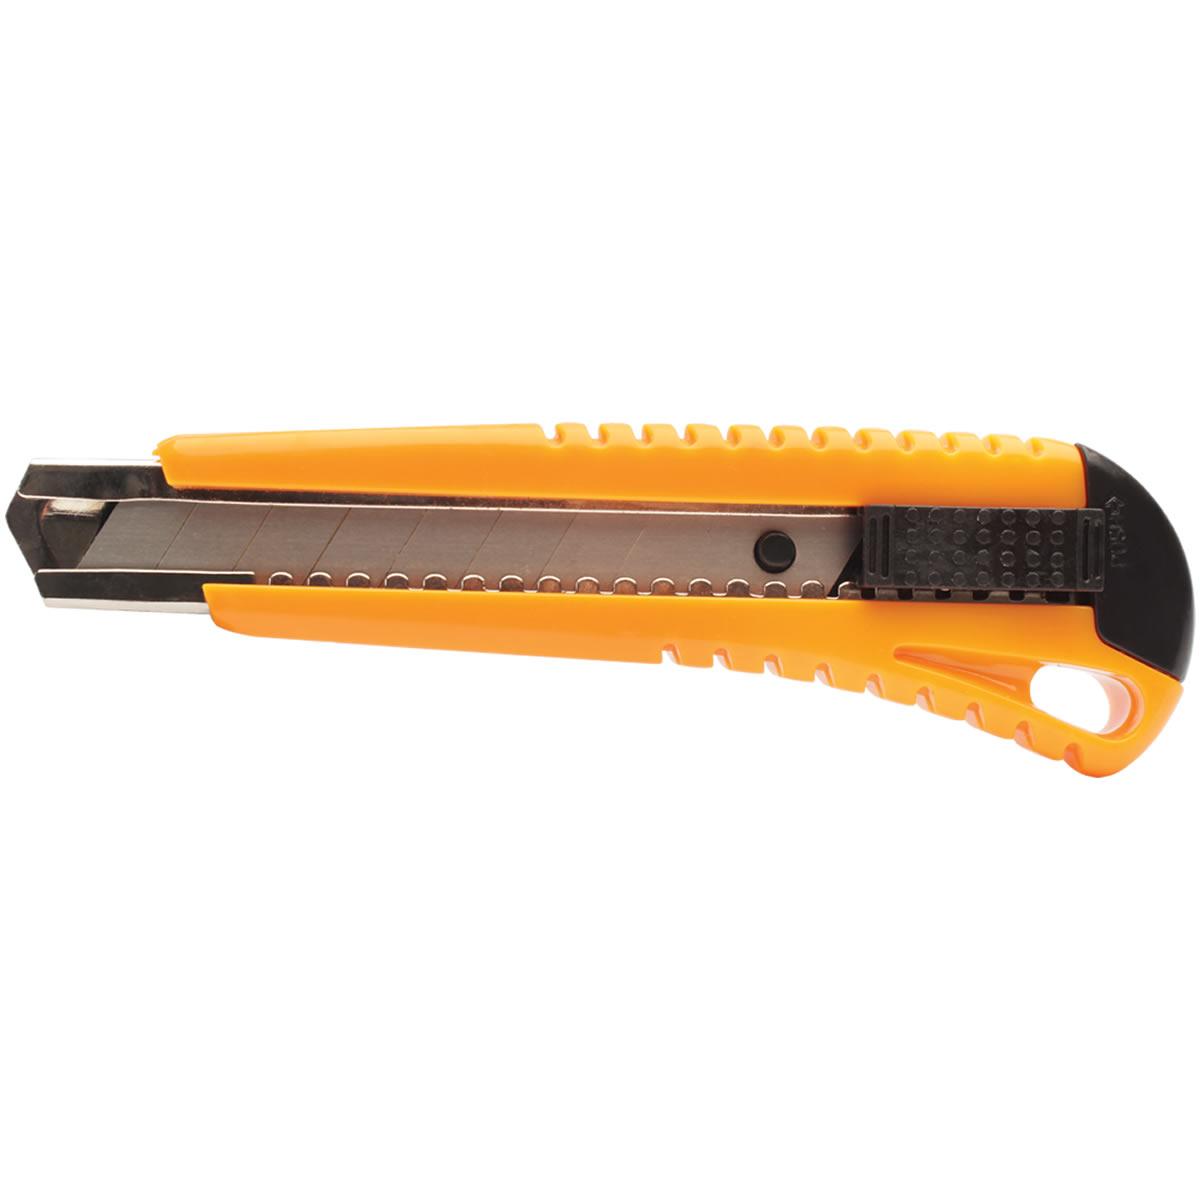 Estilete Largo 18mm Profissional Amarelo Maxprint - MX-E18